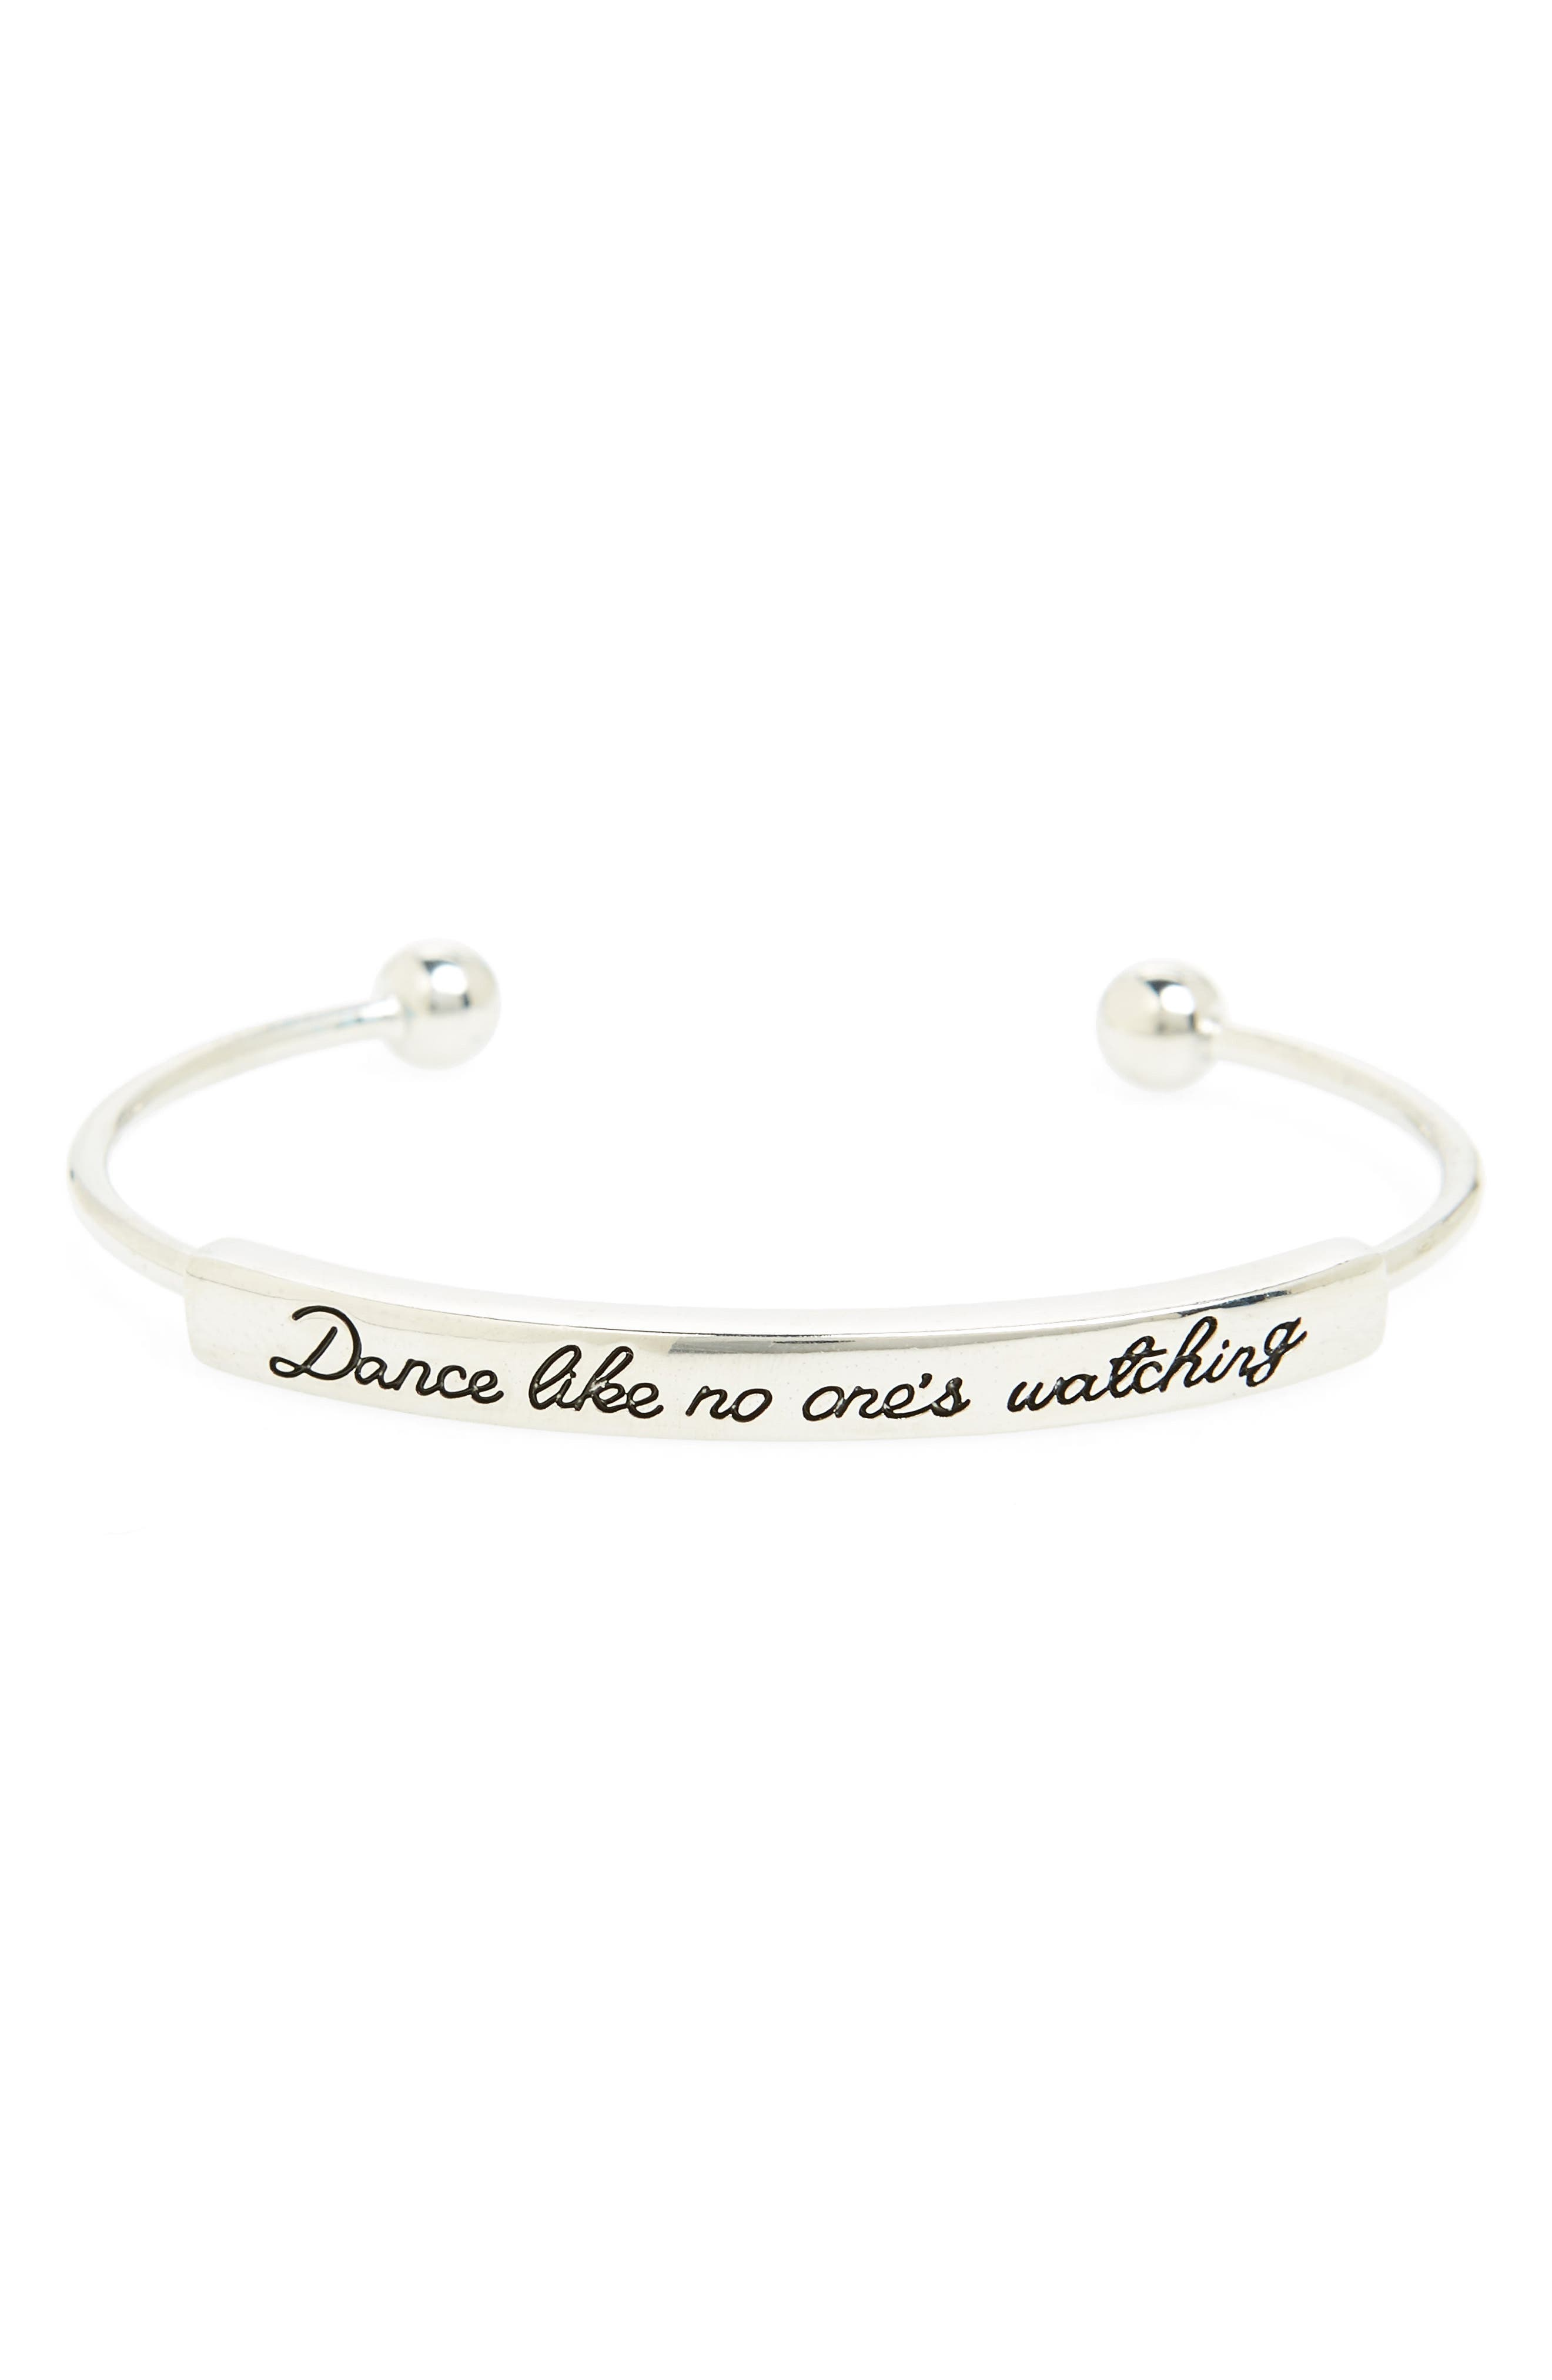 Main Image - Topshop Dance Cuff Bracelet